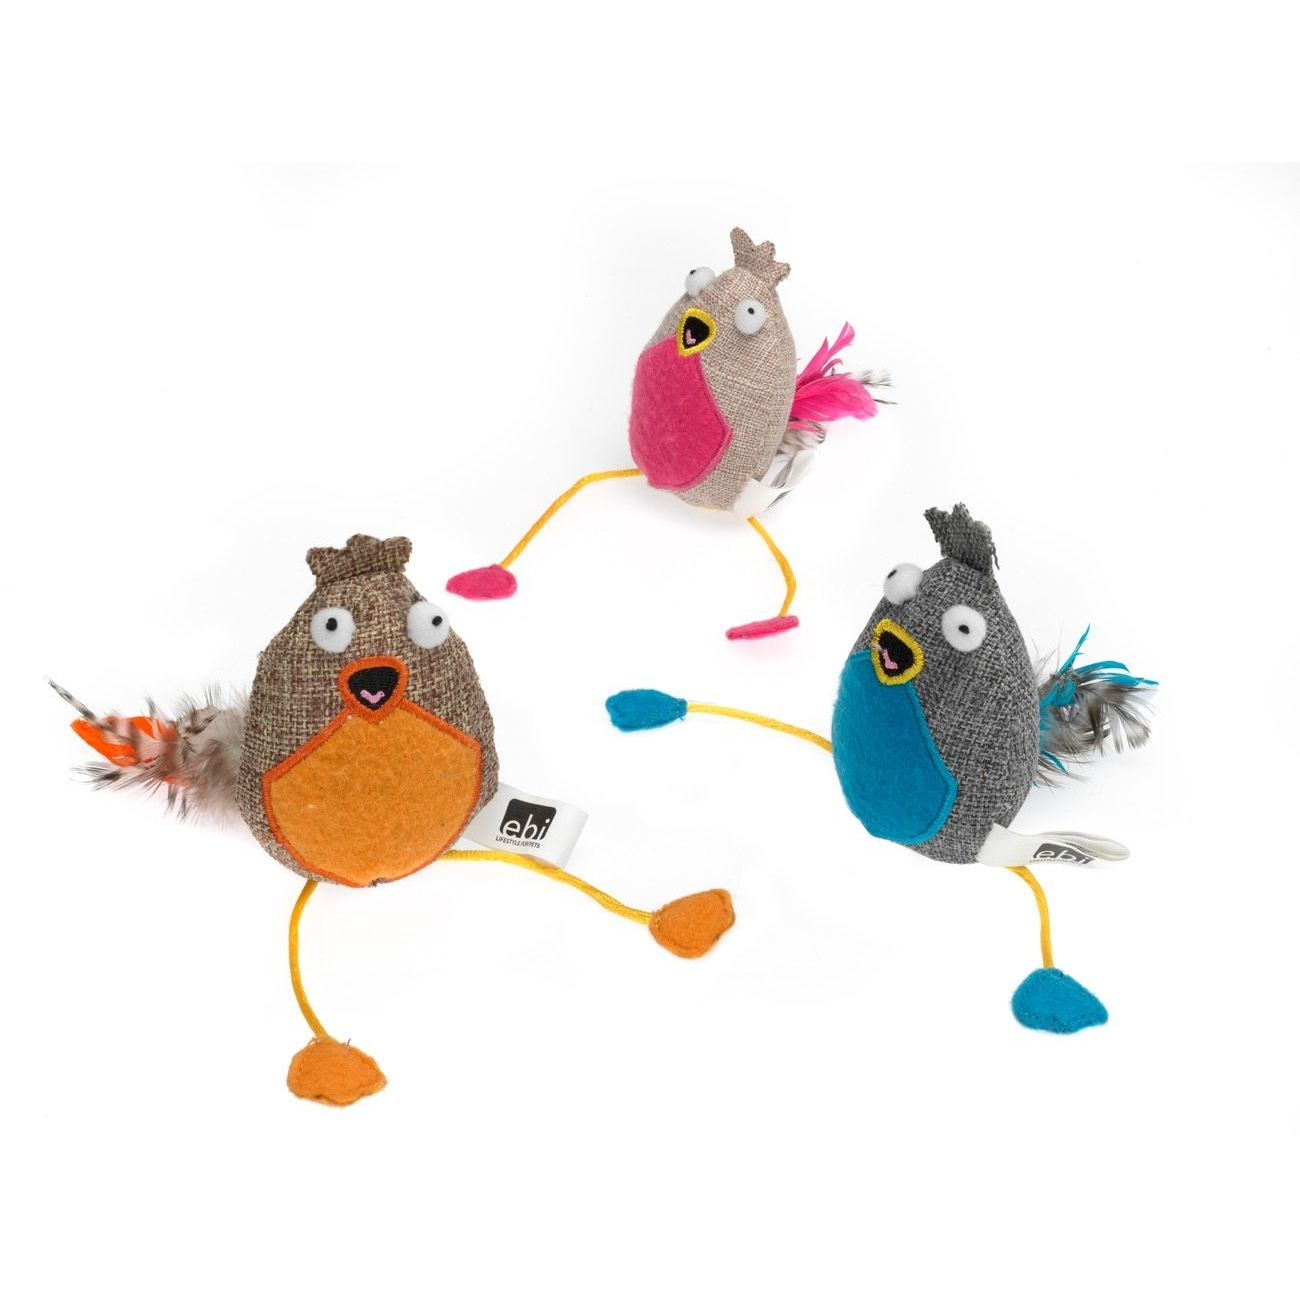 tiierisch Wanna Play Katzenspielzeug Big Bird, 8 x 7 cm